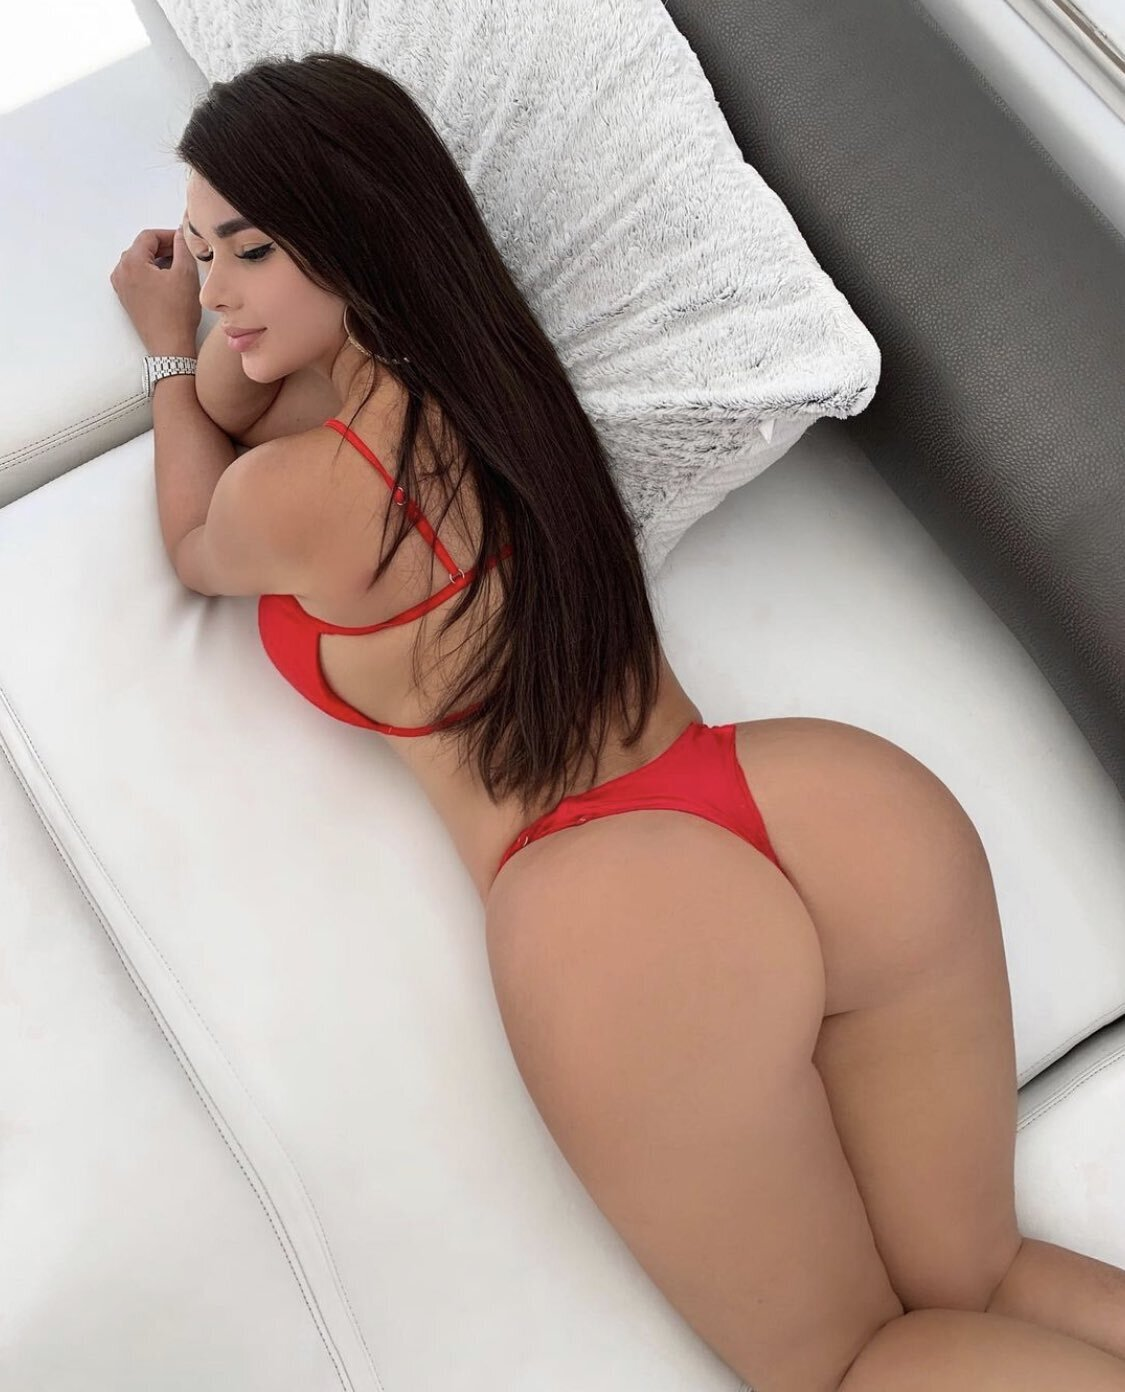 fotos chicas culonas latinas 1